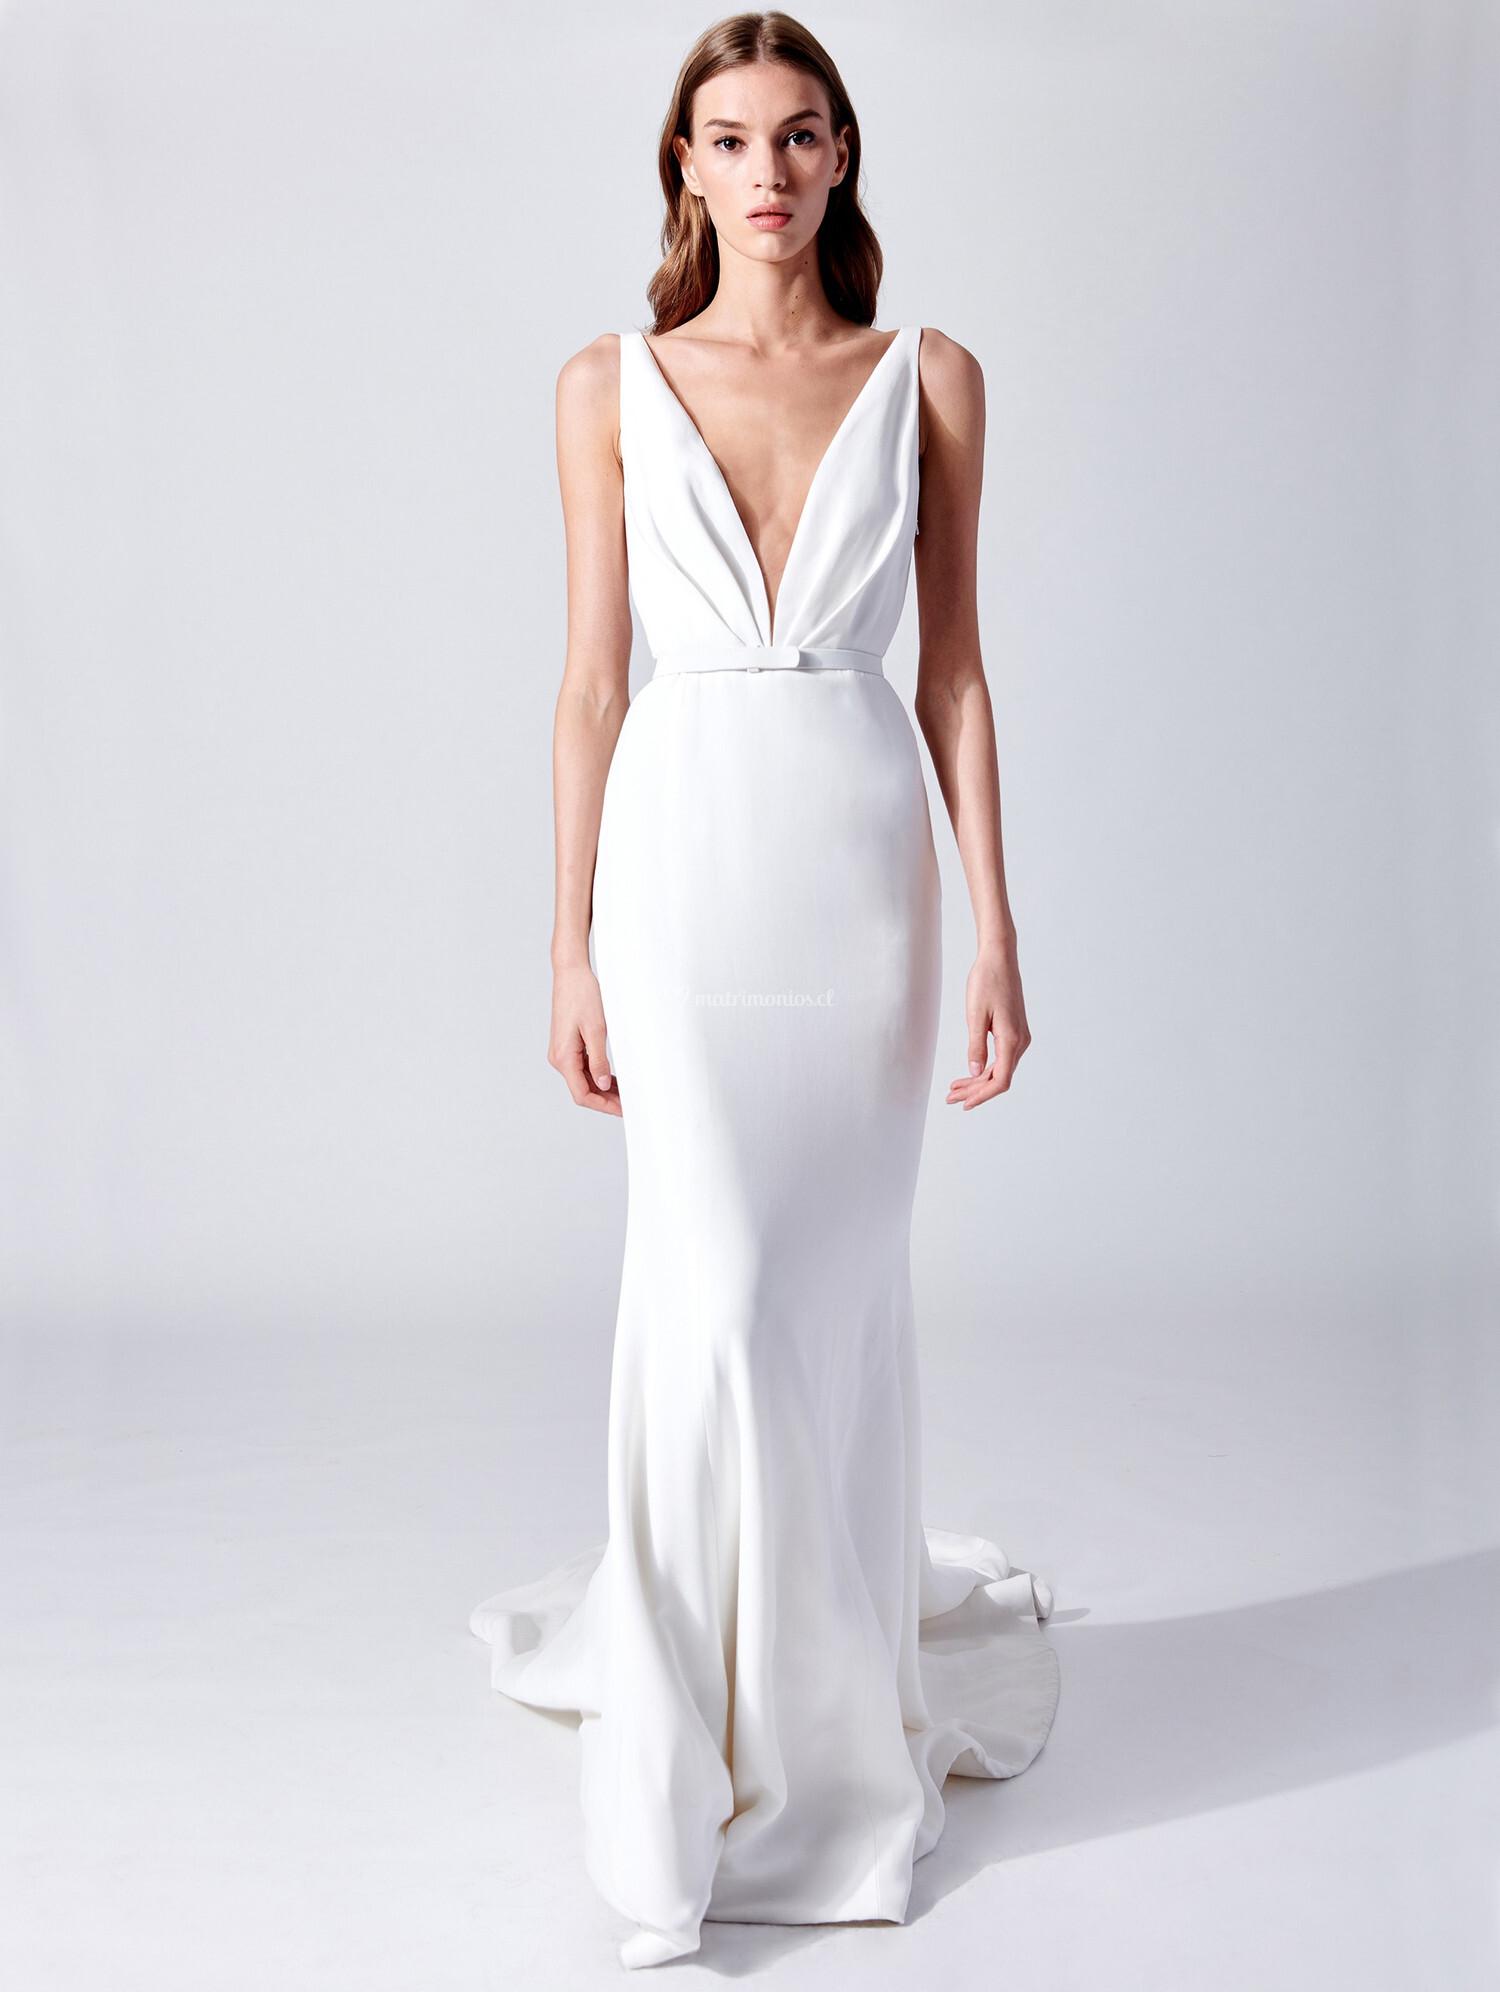 560befe3a Vestidos de Novia de Oscar de la Renta - 2019 - Matrimonios.cl